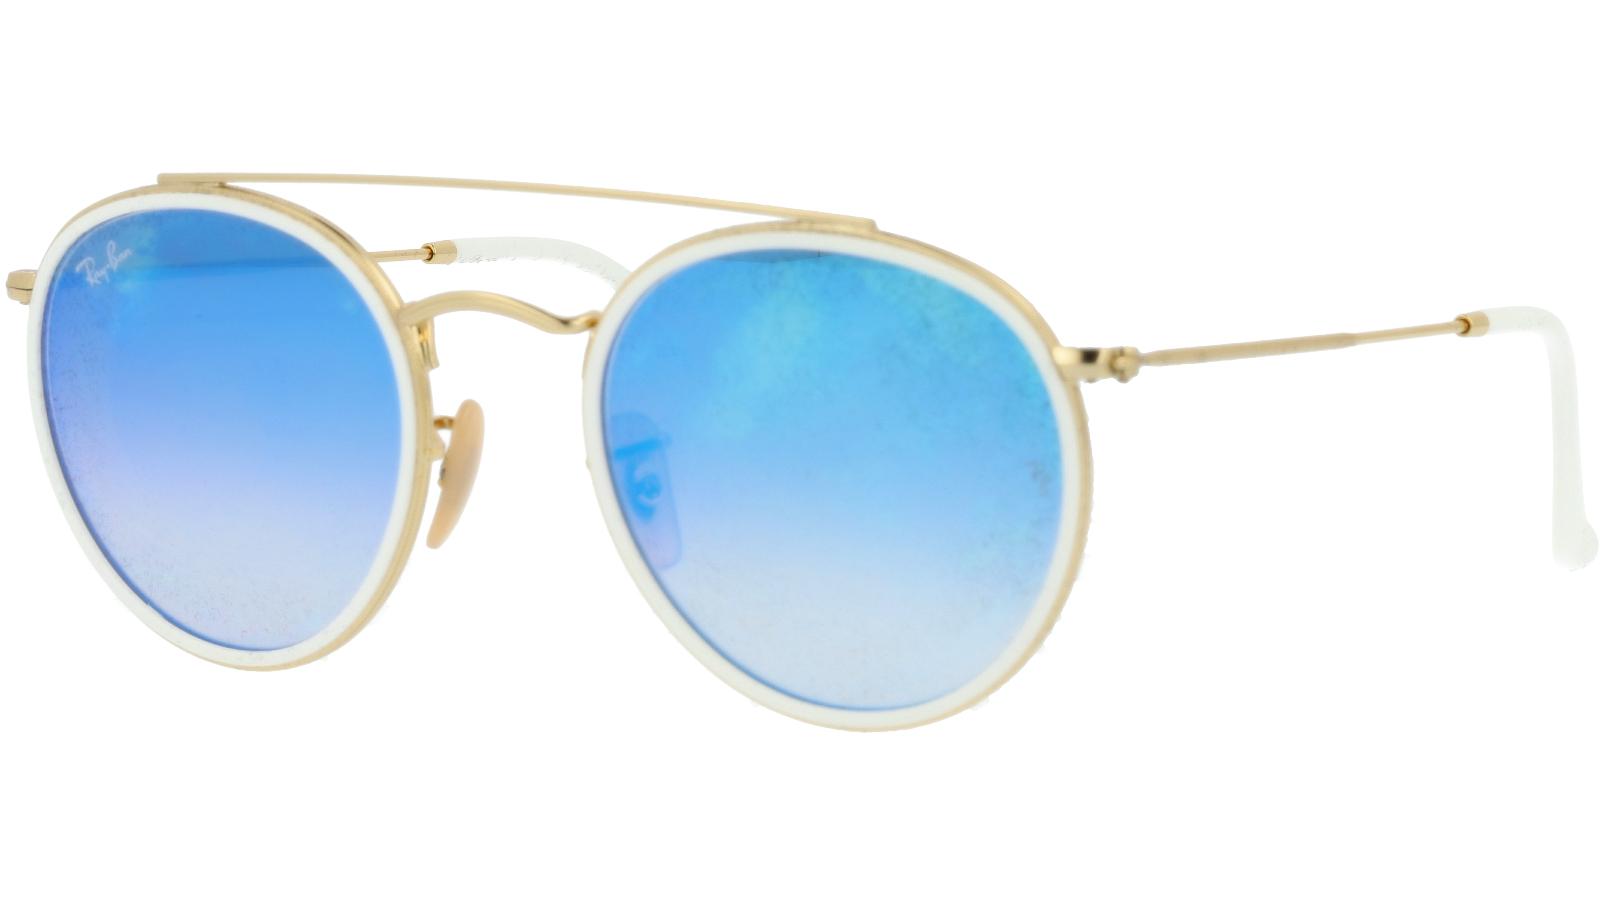 Ray-Ban RB3647N 001/4O Arista Round Sunglasses